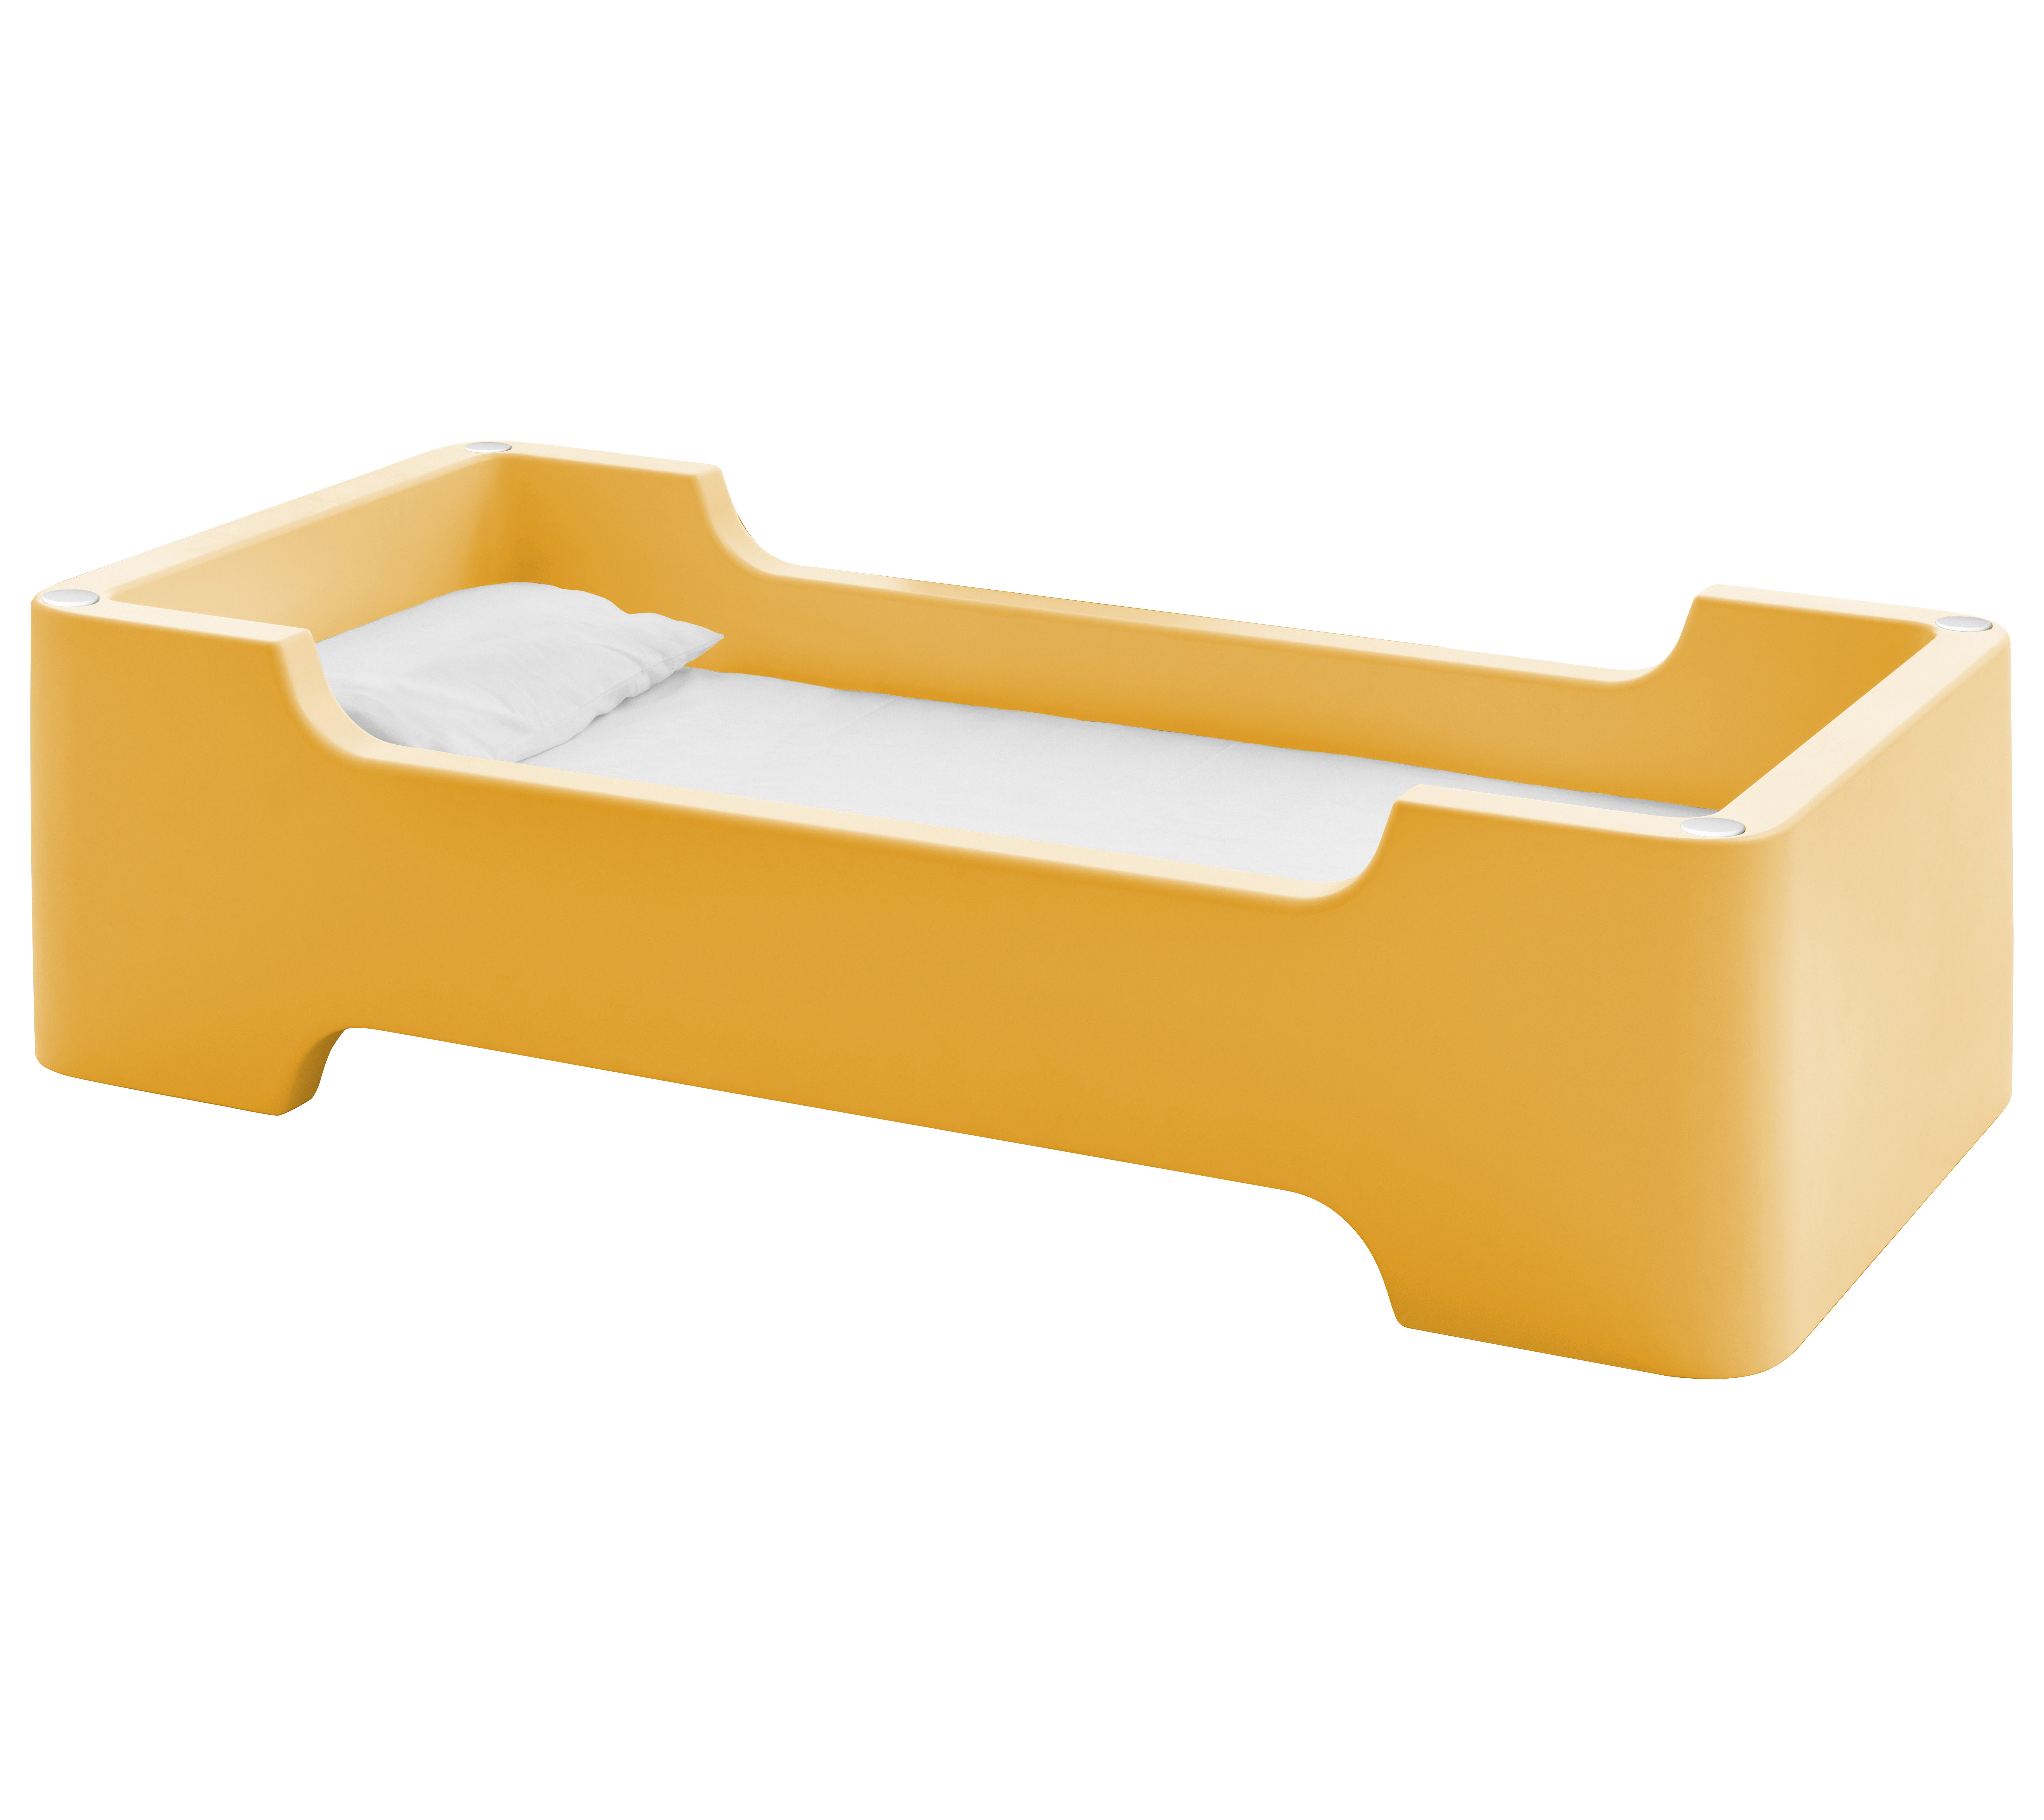 lit enfant bunky module 1 place 81 x 171 cm orange clair magis collection me too. Black Bedroom Furniture Sets. Home Design Ideas